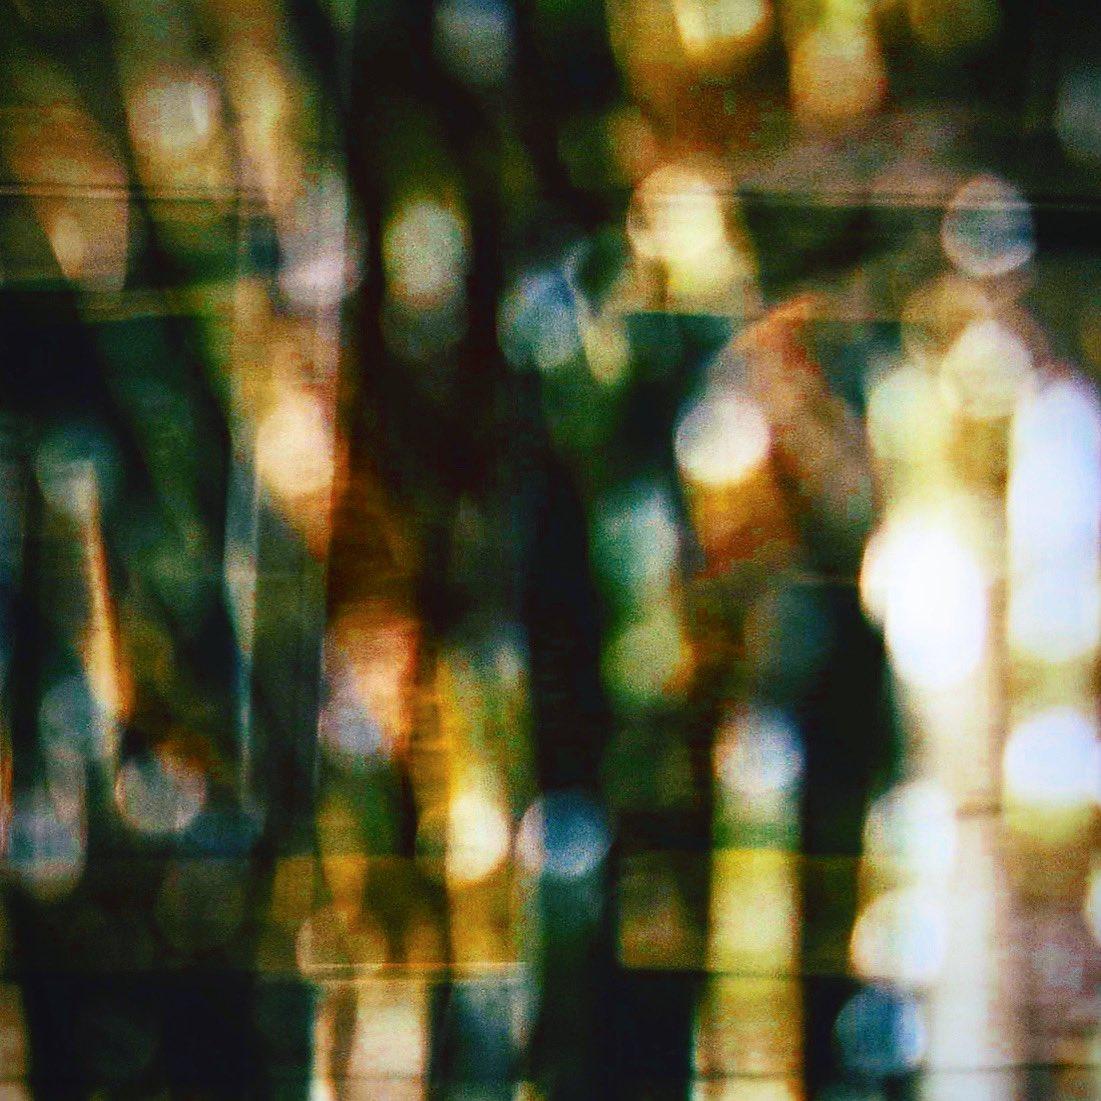 Chiasso notturno.  #foto #fotografia #arte #photography #photo #picture #photographe #camera #shot #artday #igrecommend #moments #lensculture #artofvisuals #nikon #camera #artwork #artofinstagram #arts #design #designinspiration #designboom #designlovers #光 #アートワーク #フォトpic.twitter.com/7grlwKSwak